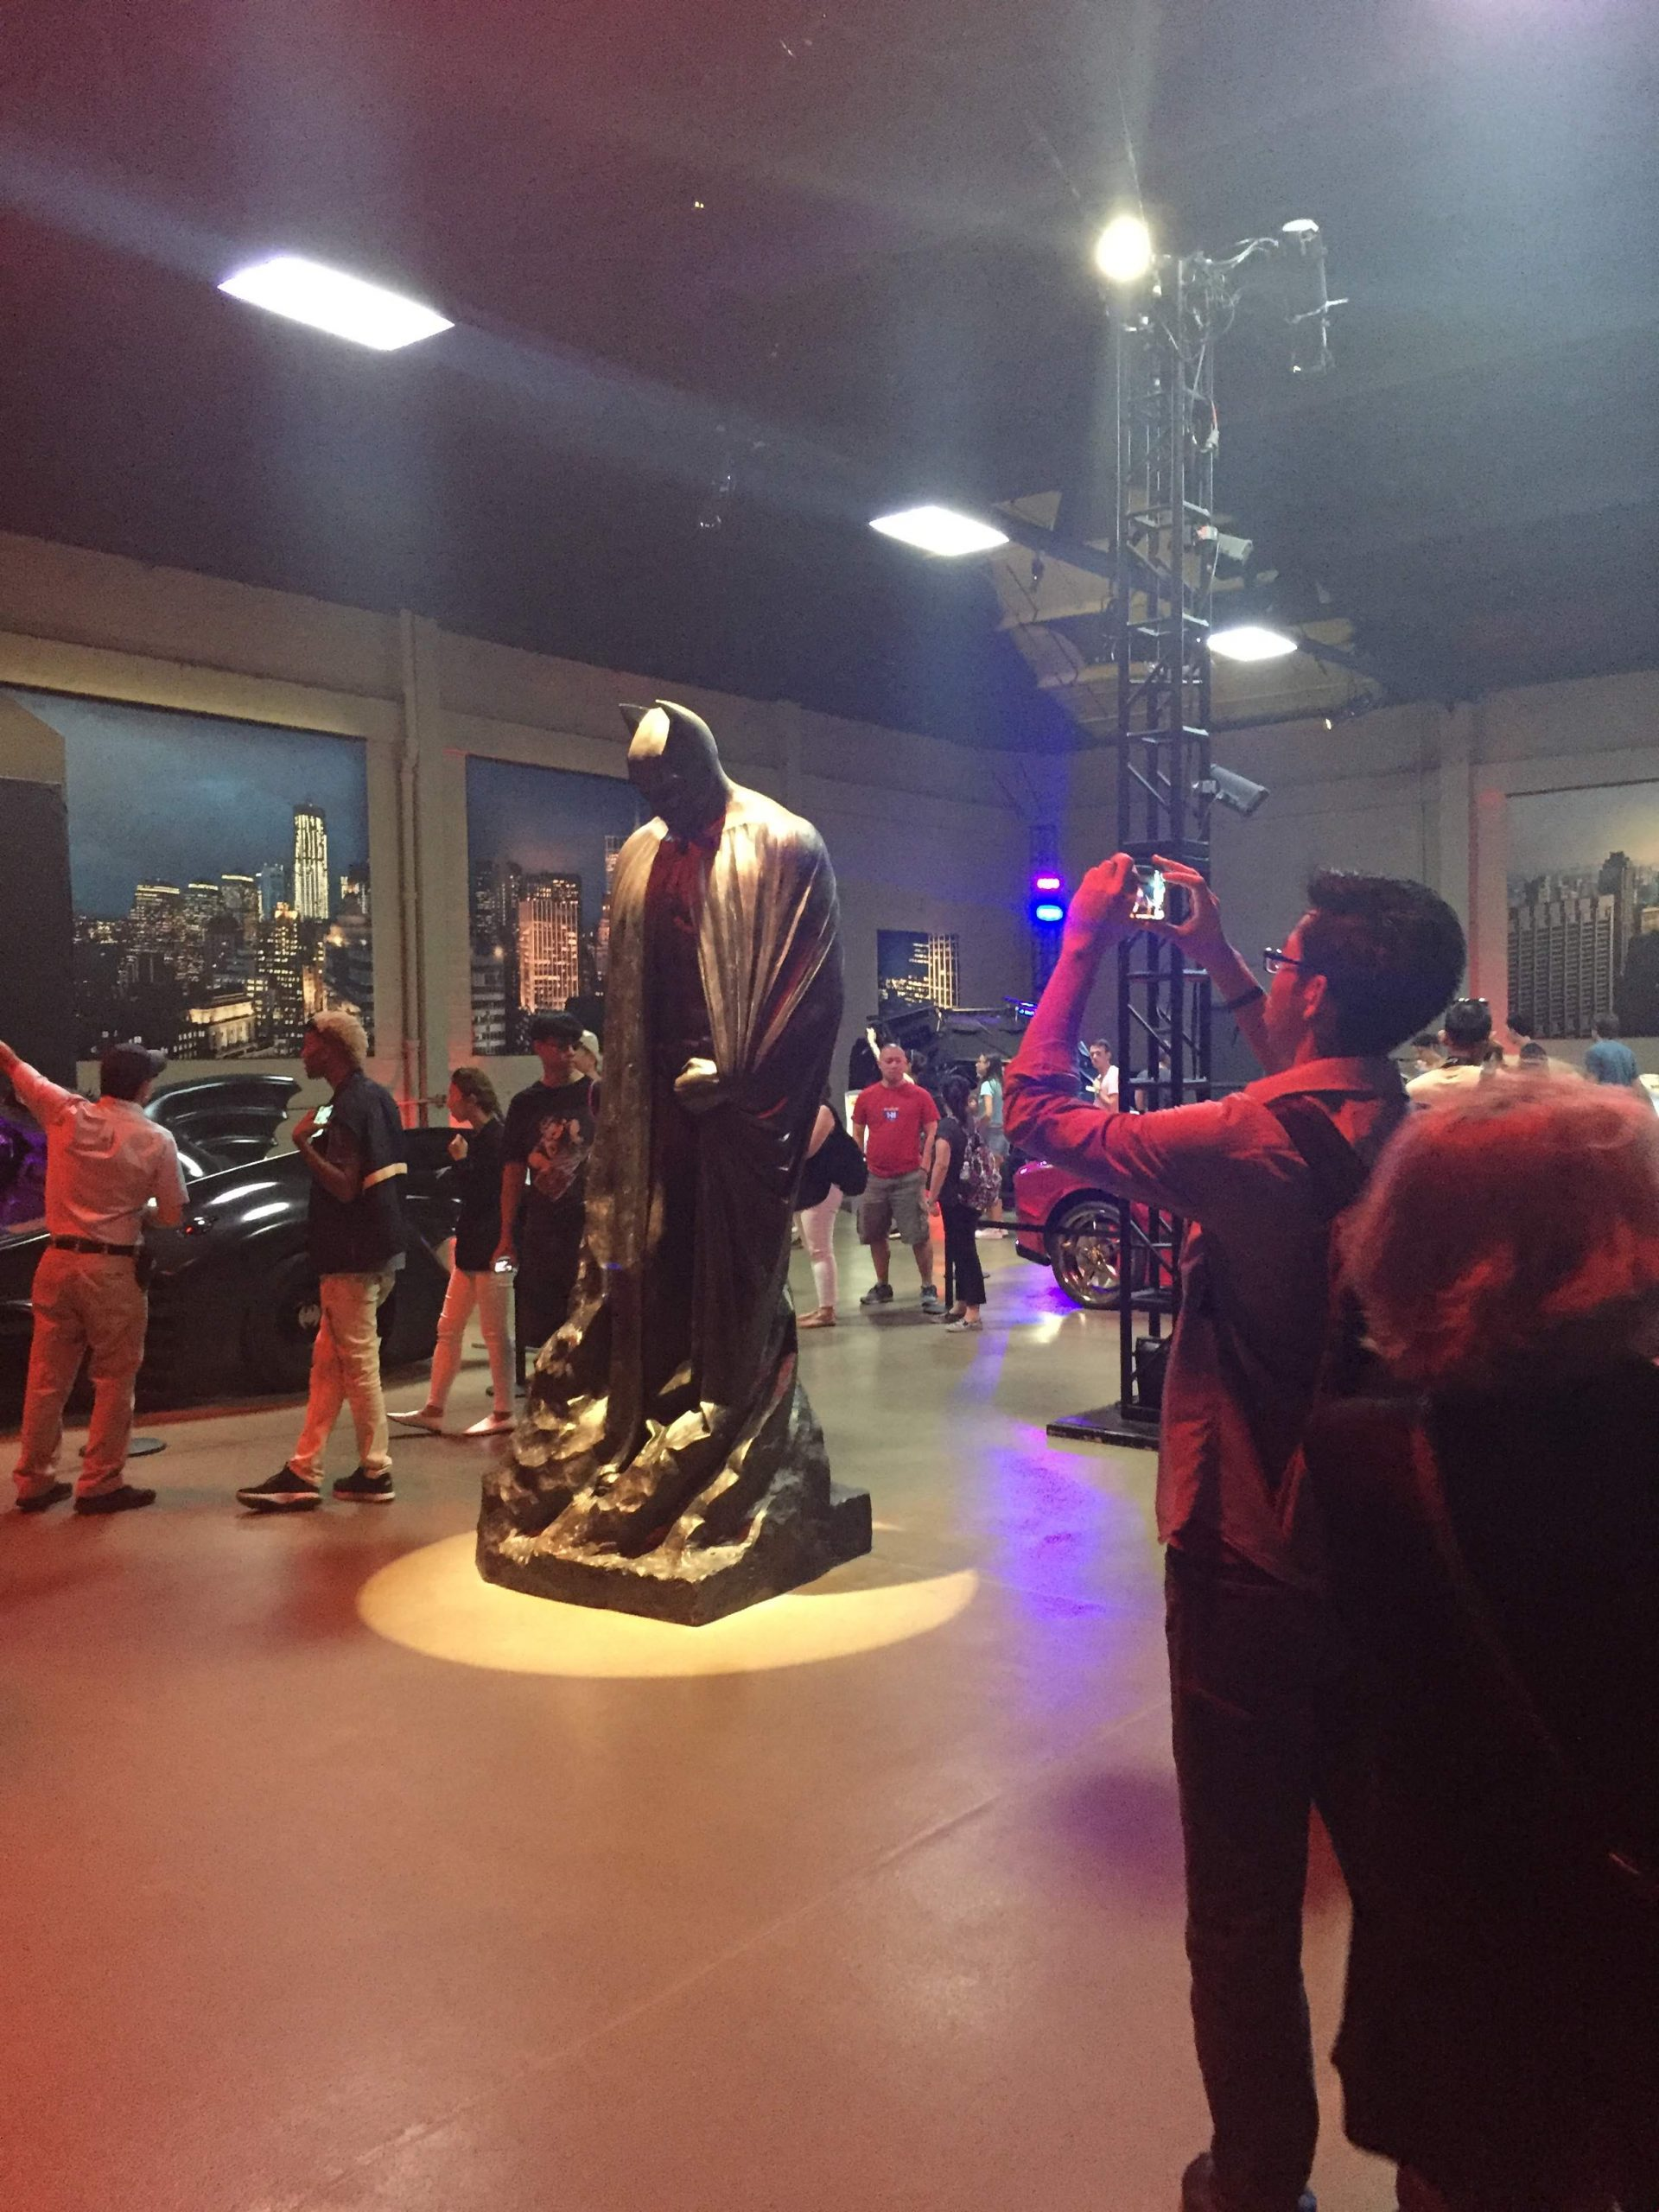 Sightings on the Warner Bros Studio tour: DC Comics exhibit